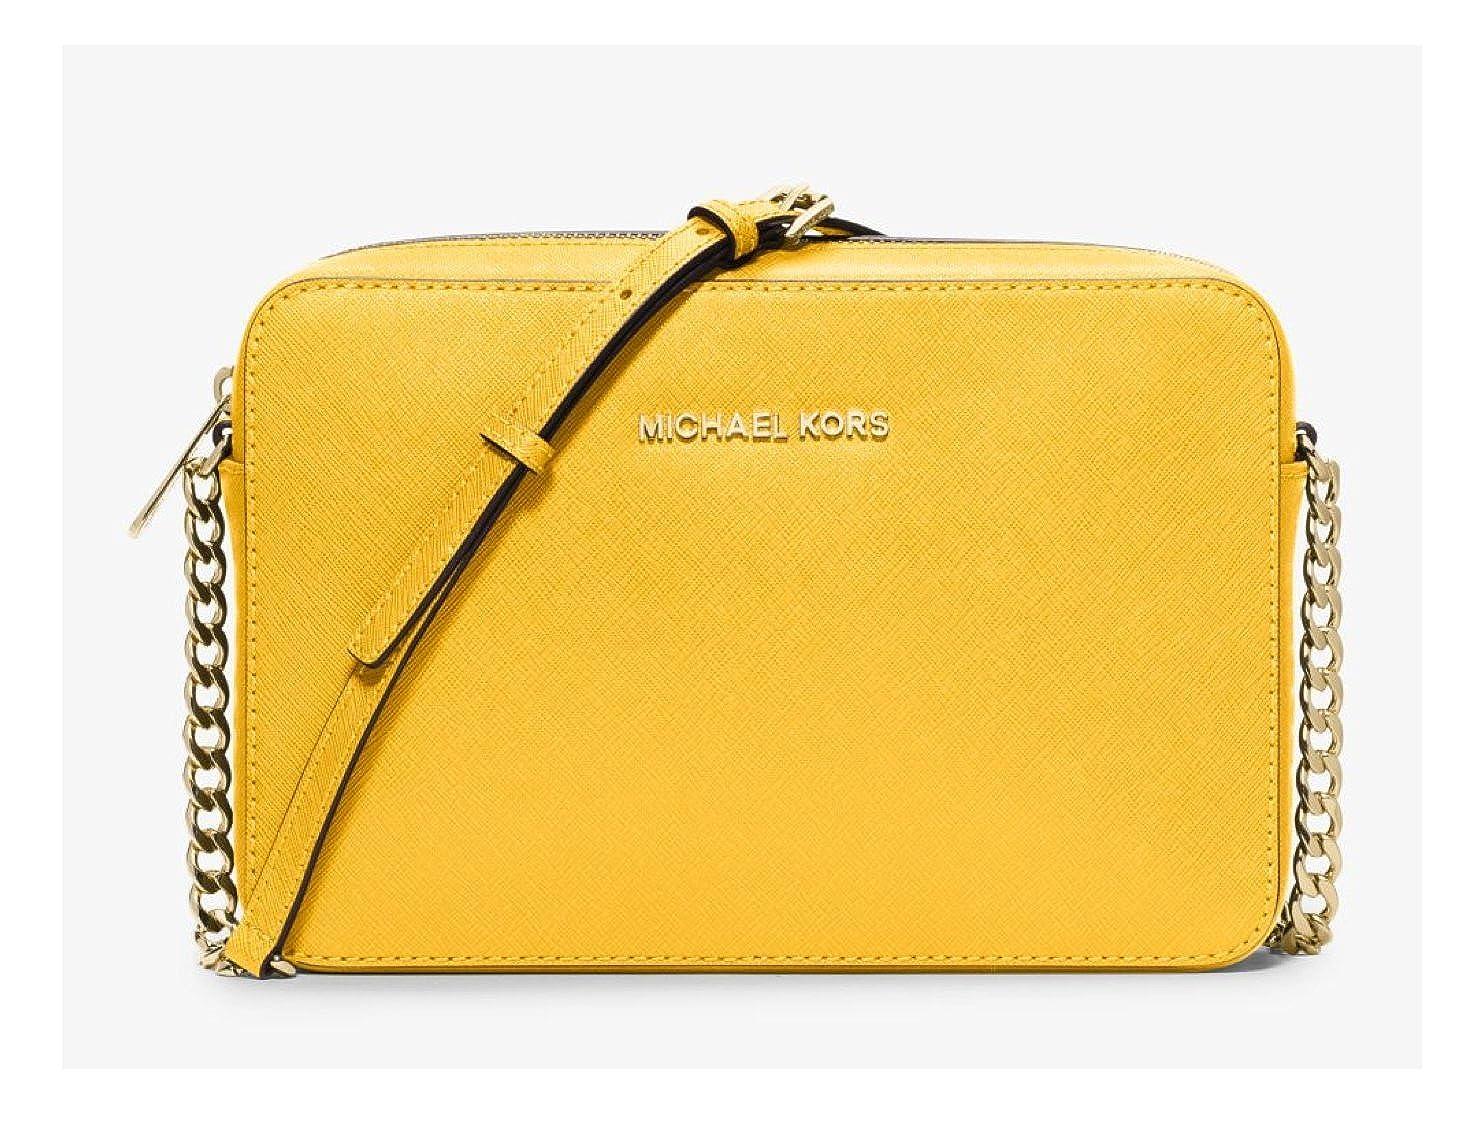 ff26db740b Michael Kors Jet Set Leather Large EW Crossbody Bag Yellow Citrus   Amazon.co.uk  Shoes   Bags